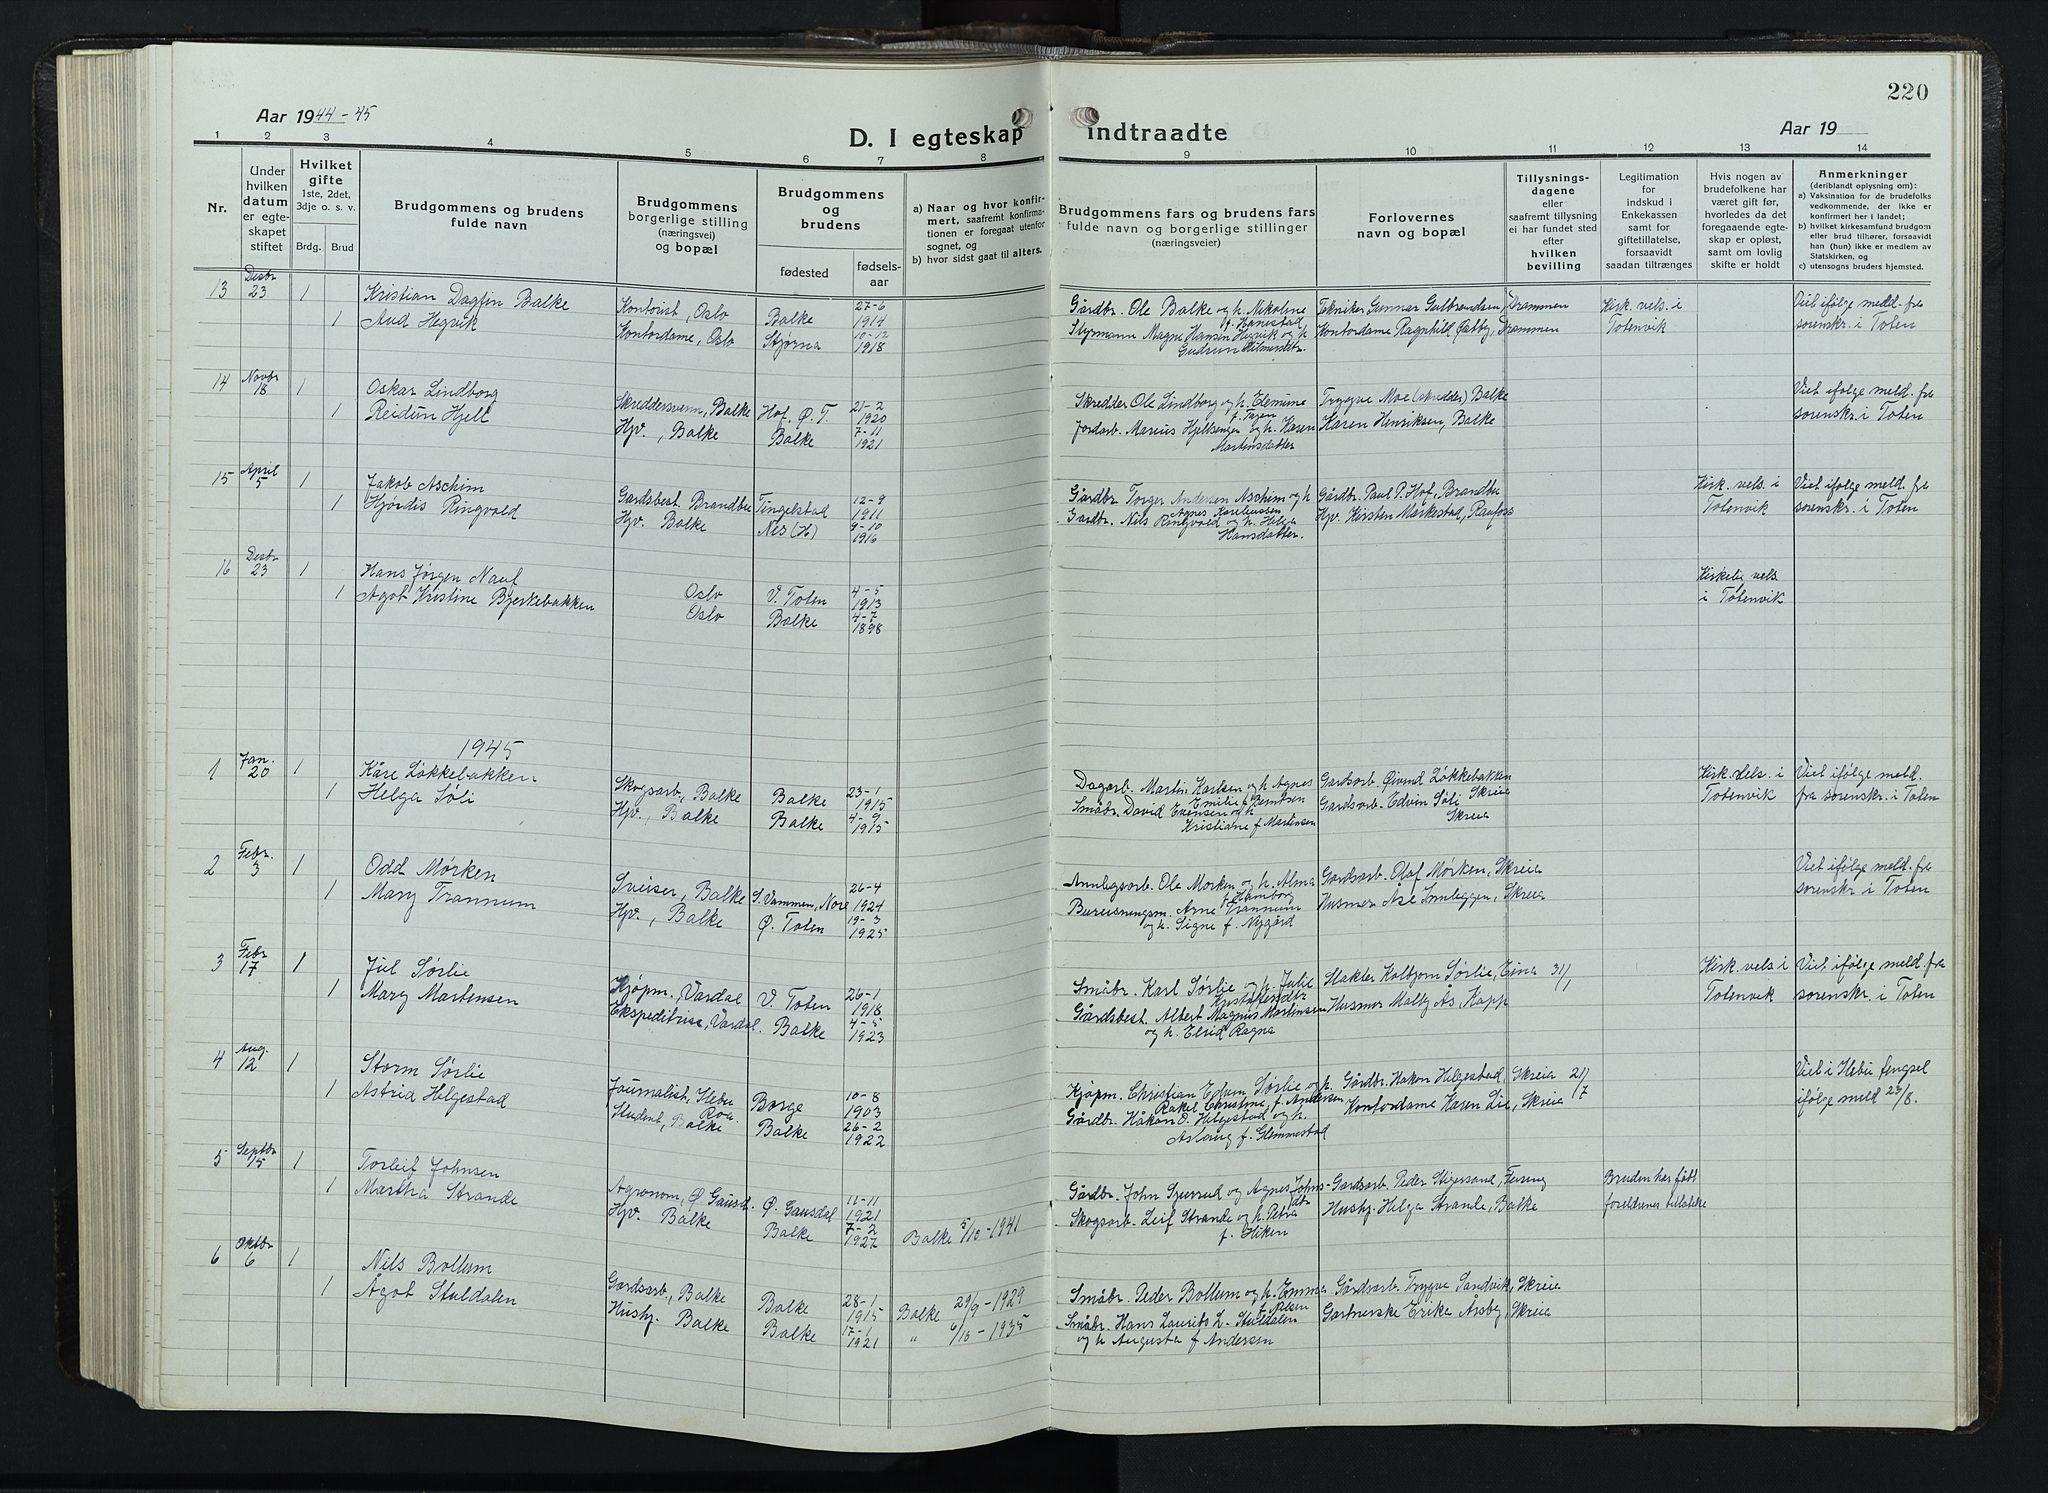 SAH, Balke prestekontor, Klokkerbok nr. 1, 1920-1955, s. 220